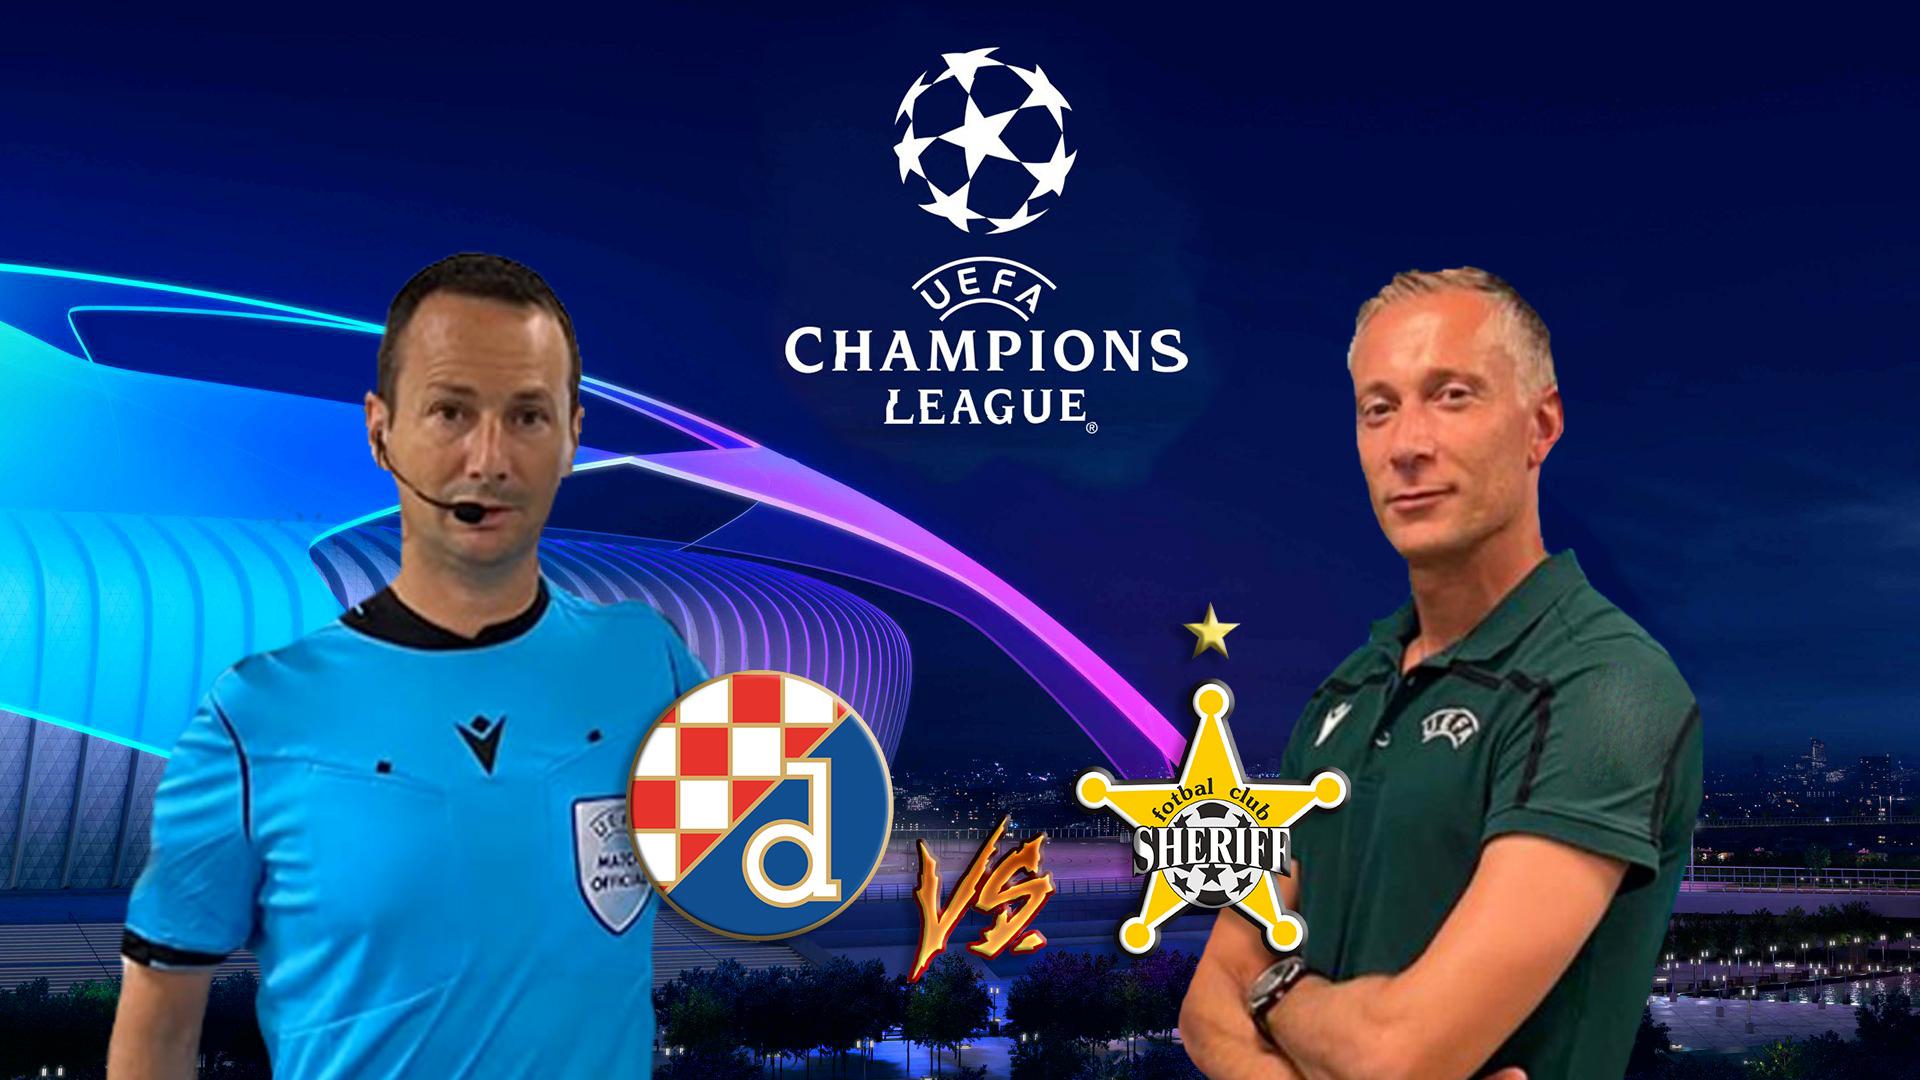 Dinamo Zagabria Sheriff Tiraspo Valeri e Giallatini